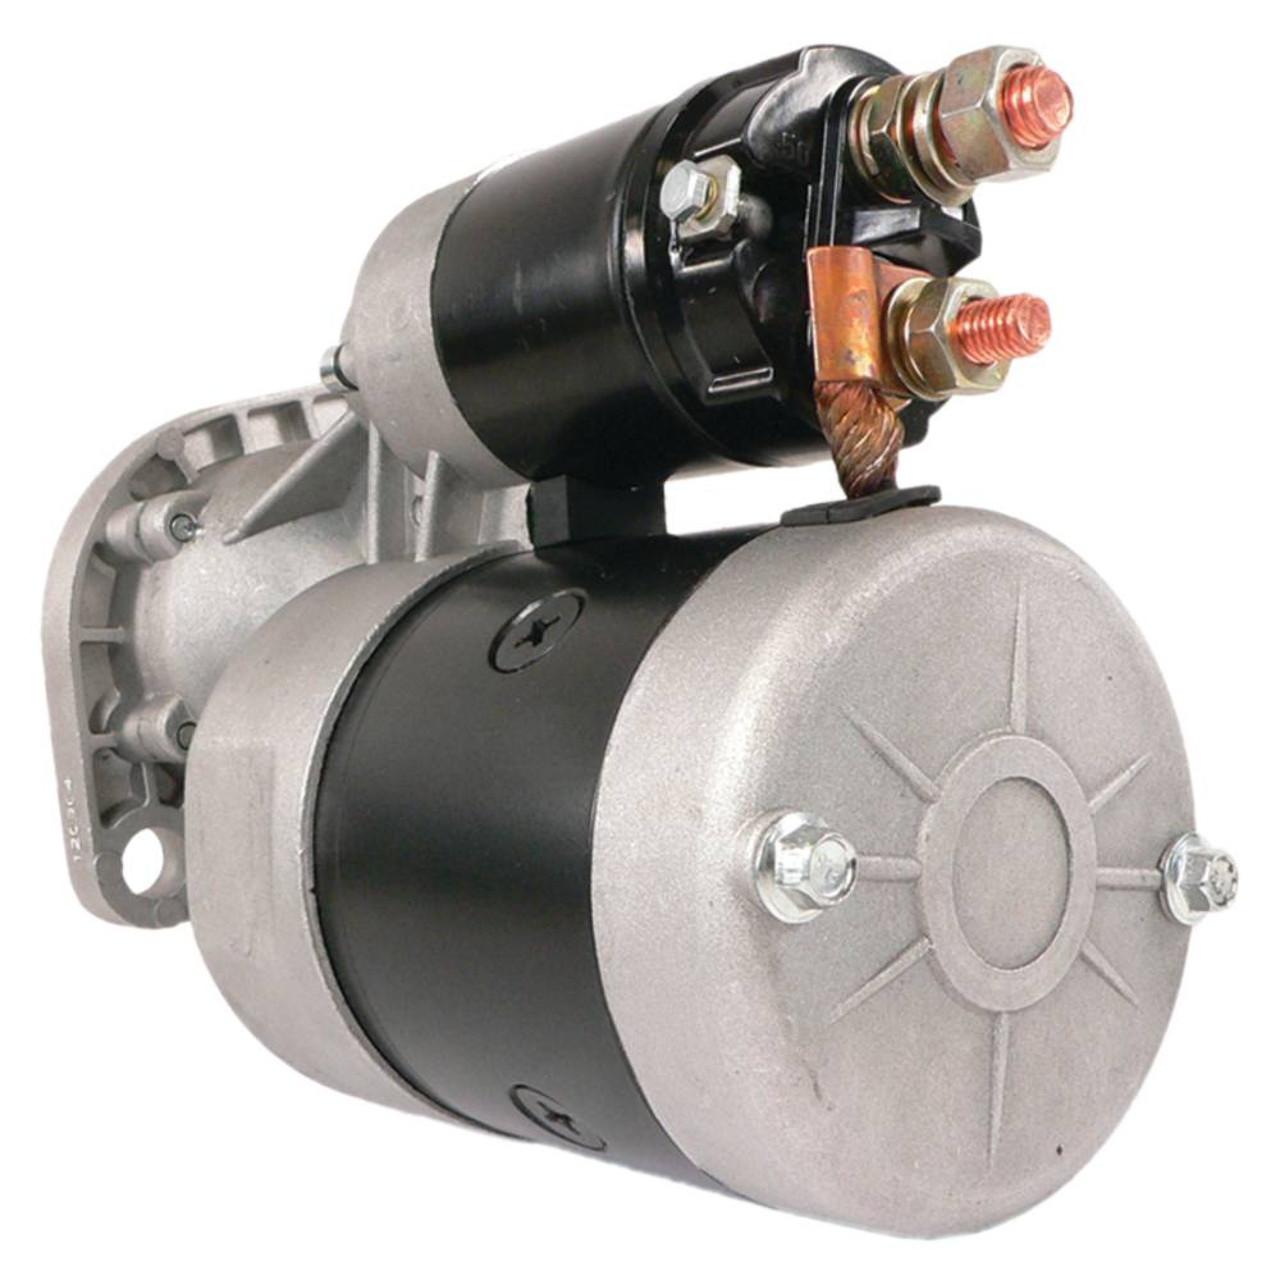 medium resolution of  new starter for john deere tractor ty6720 complete tractor on john deere 6420 wiring